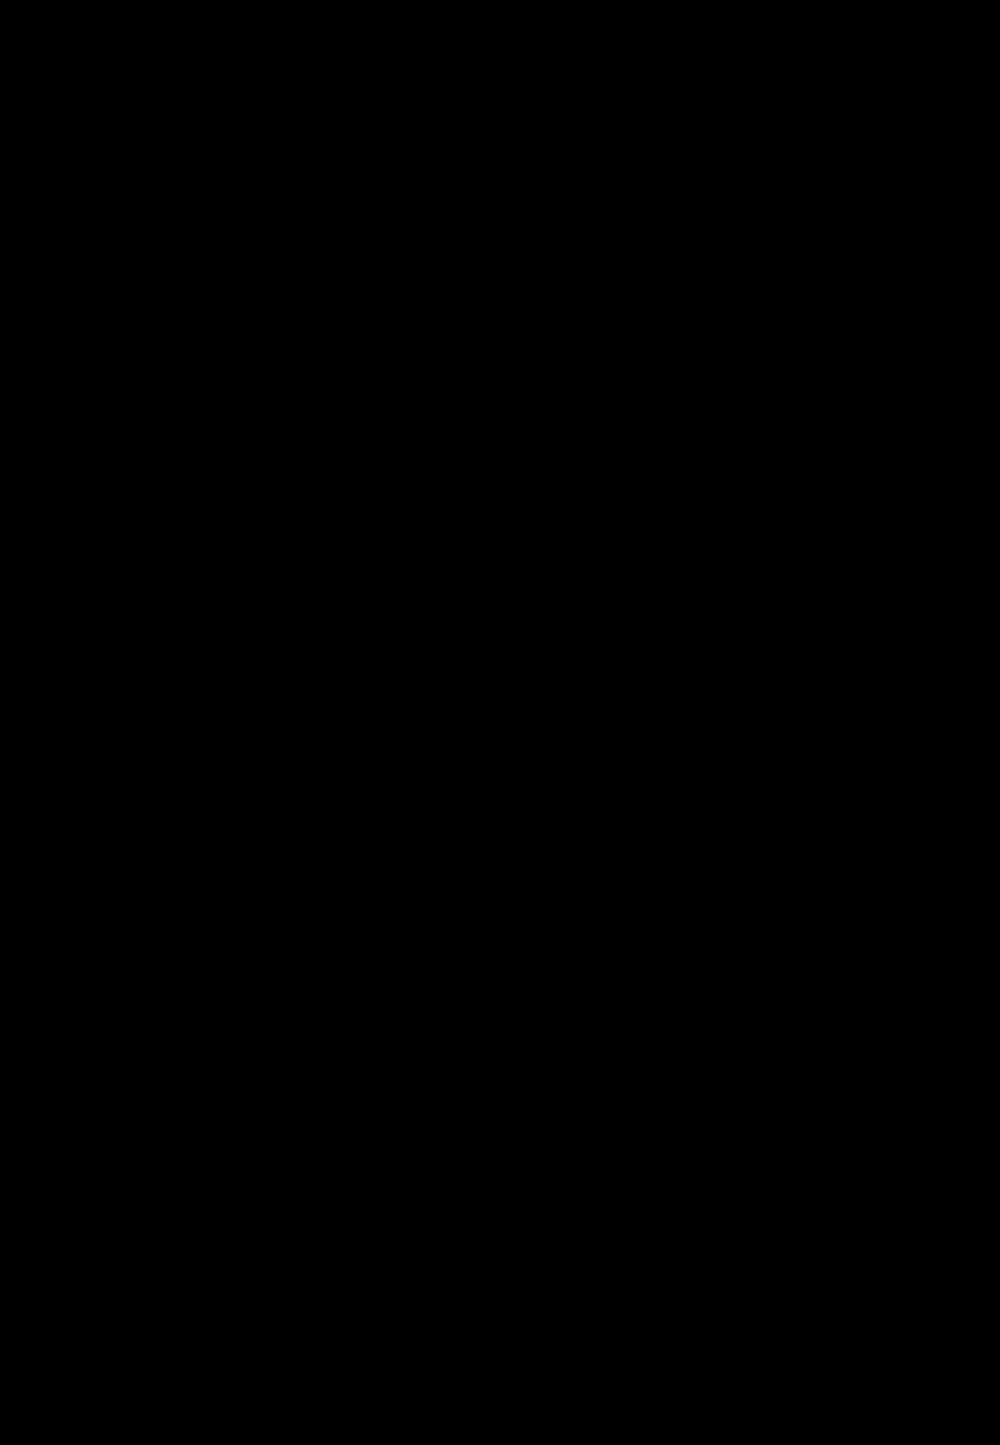 UndergroundSupplyCo_Logo_LogoTypeAndIcon_Black.png